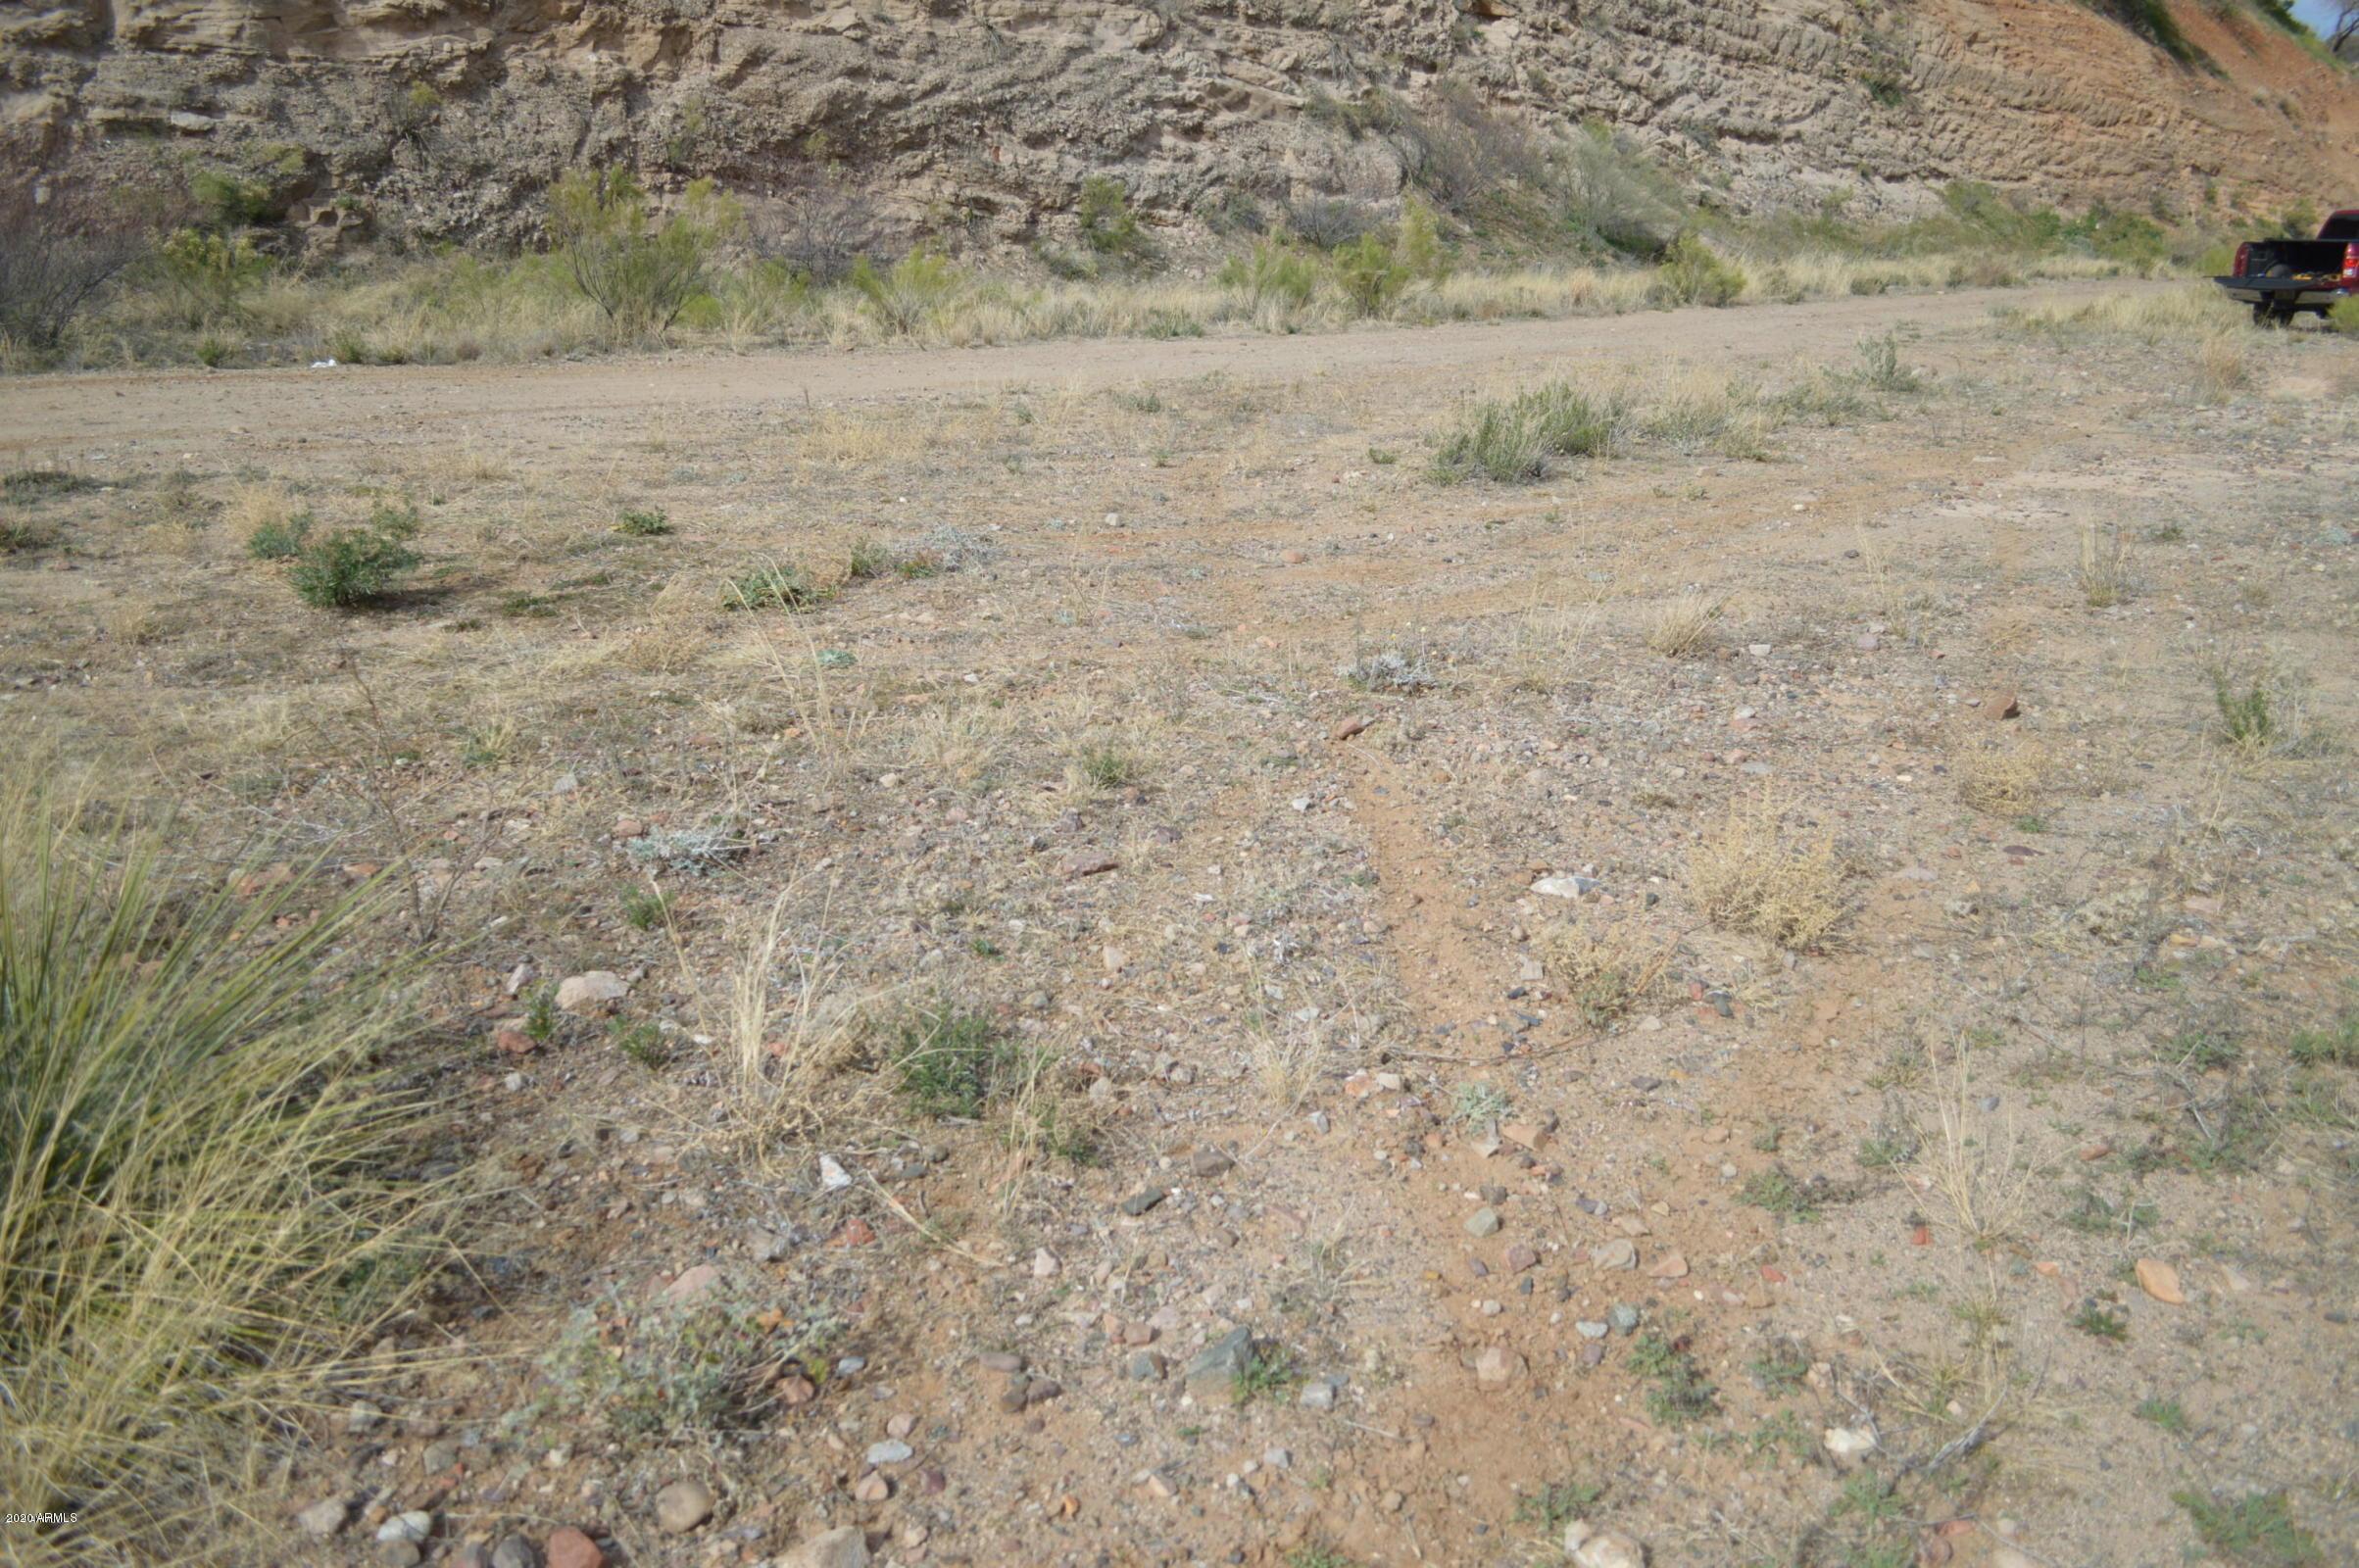 Lot 155 N Pinaleno Pass Road # 155, Globe, Arizona 85501, ,Land,For Sale,Lot 155 N Pinaleno Pass Road # 155,6019243